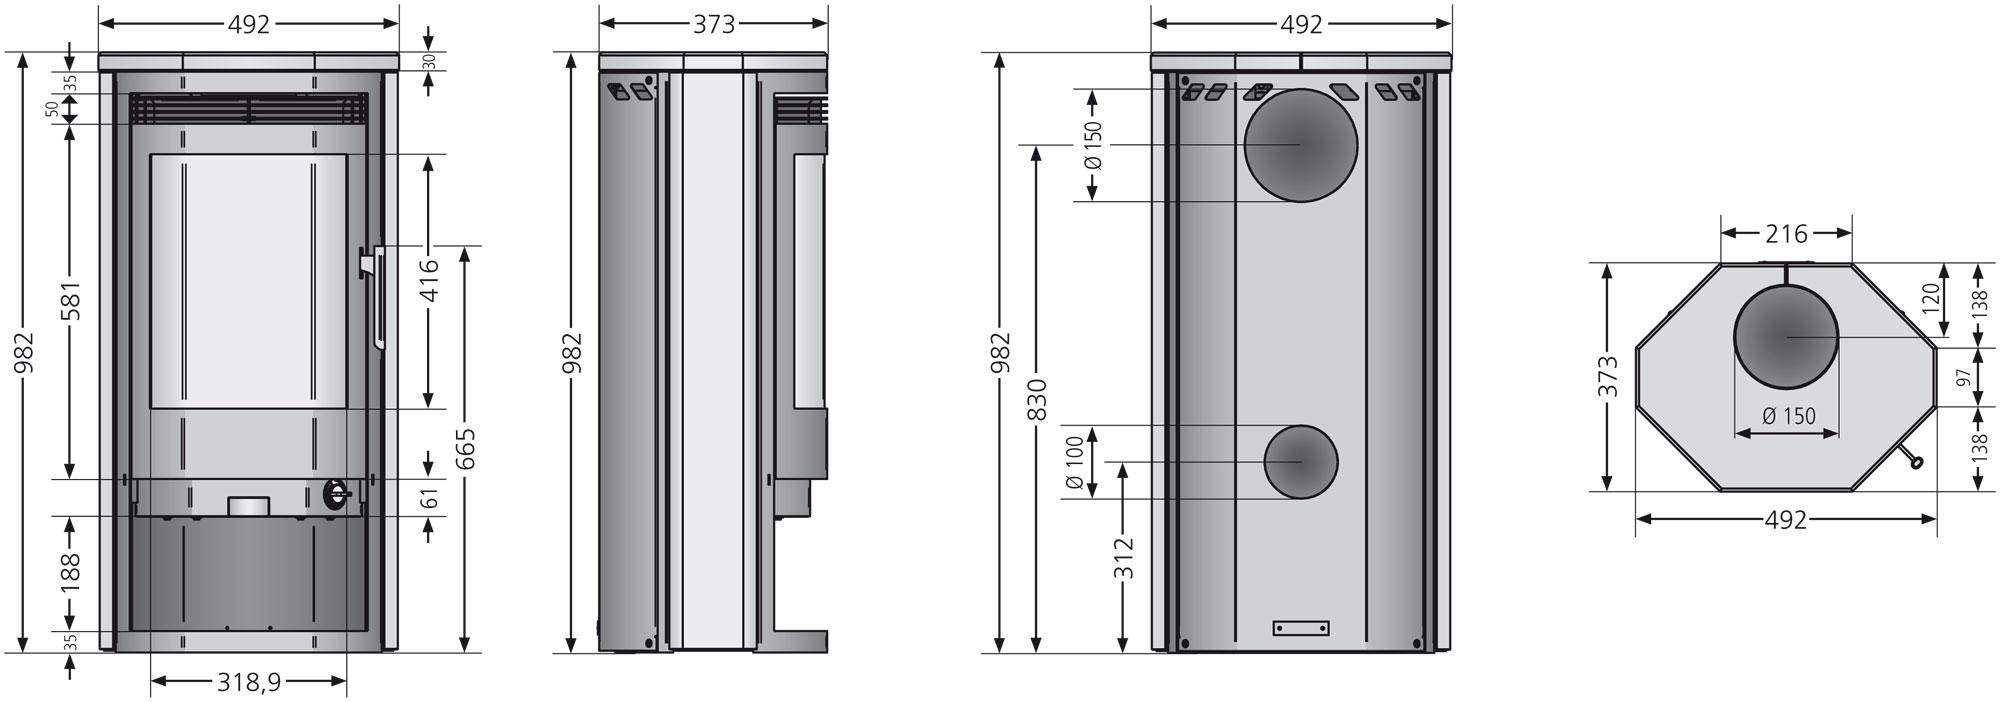 Kaminofen / Dauerbrandofen Justus Usedom 5 D Stahl grau 5kW Bild 2